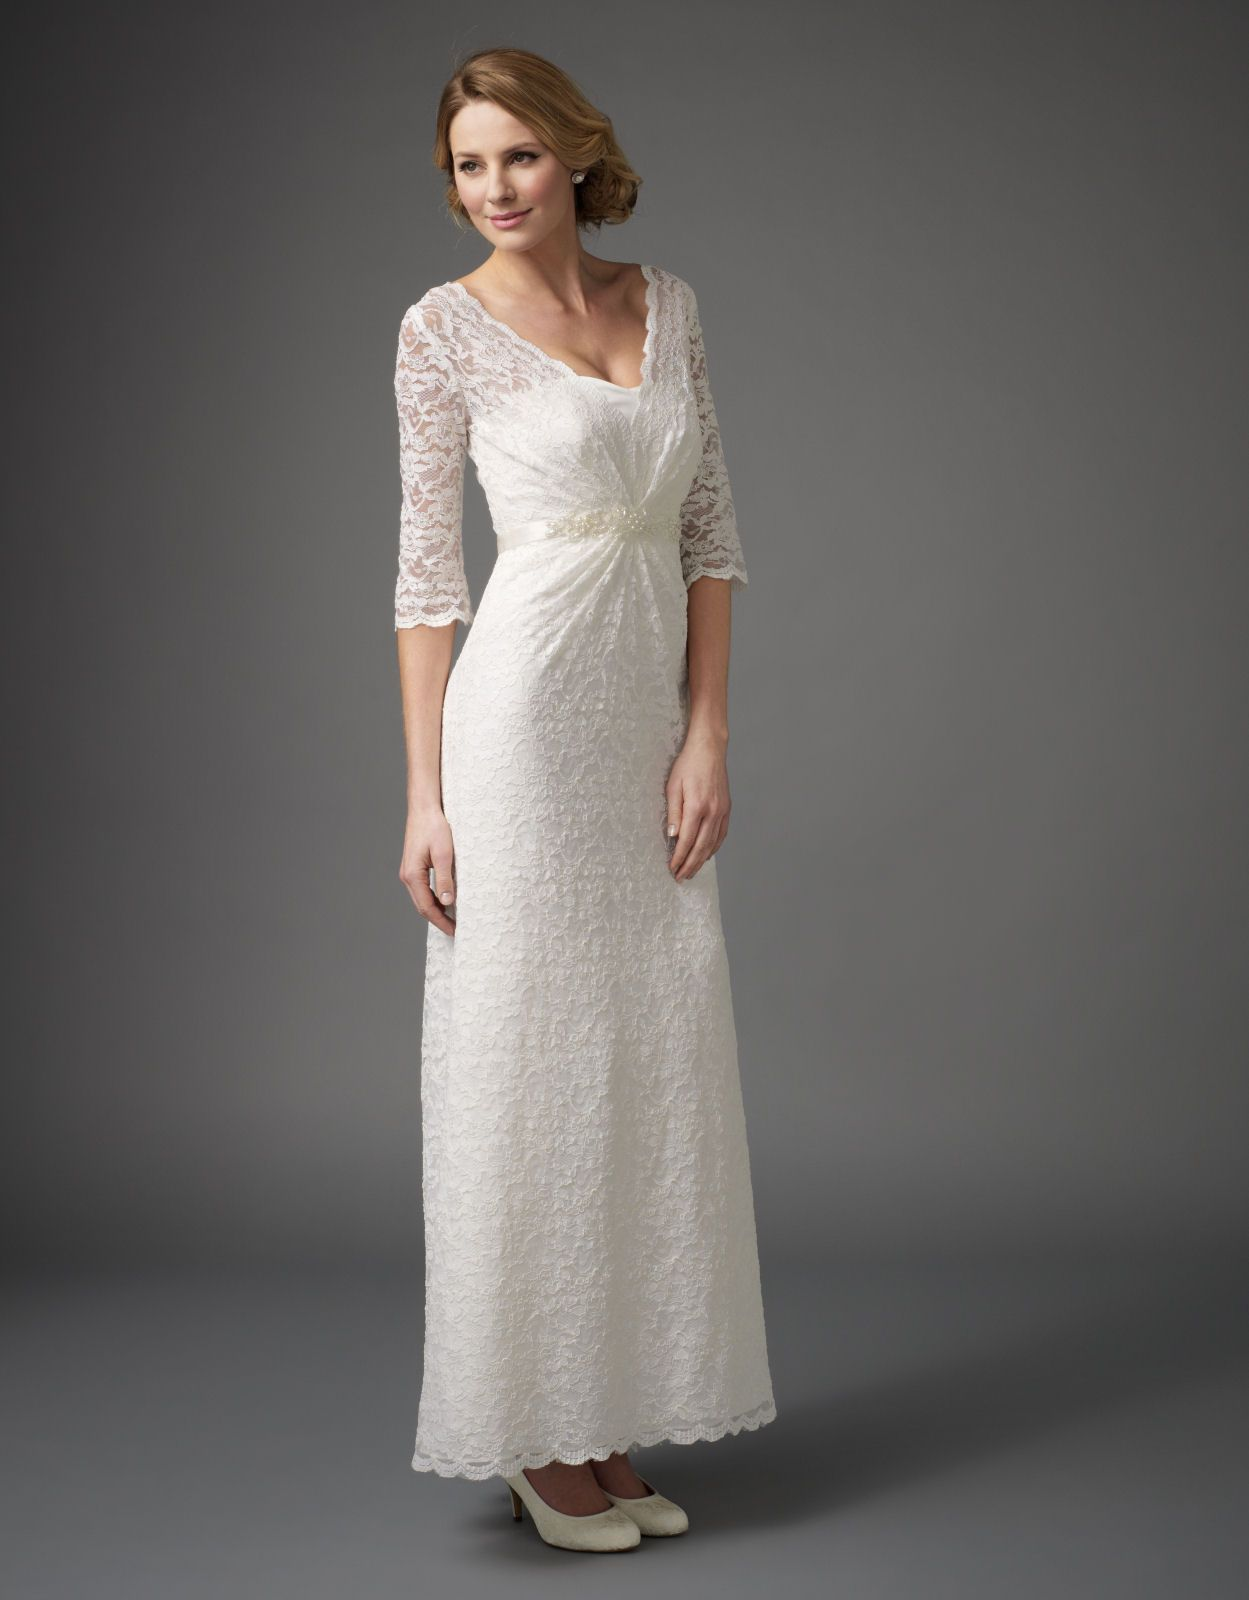 Monsoon Wedding Dresses Wedding Dress Gallery Wedding Heart Monsoon Wedding Dresses High Street Wedding Dresses Wedding Dresses